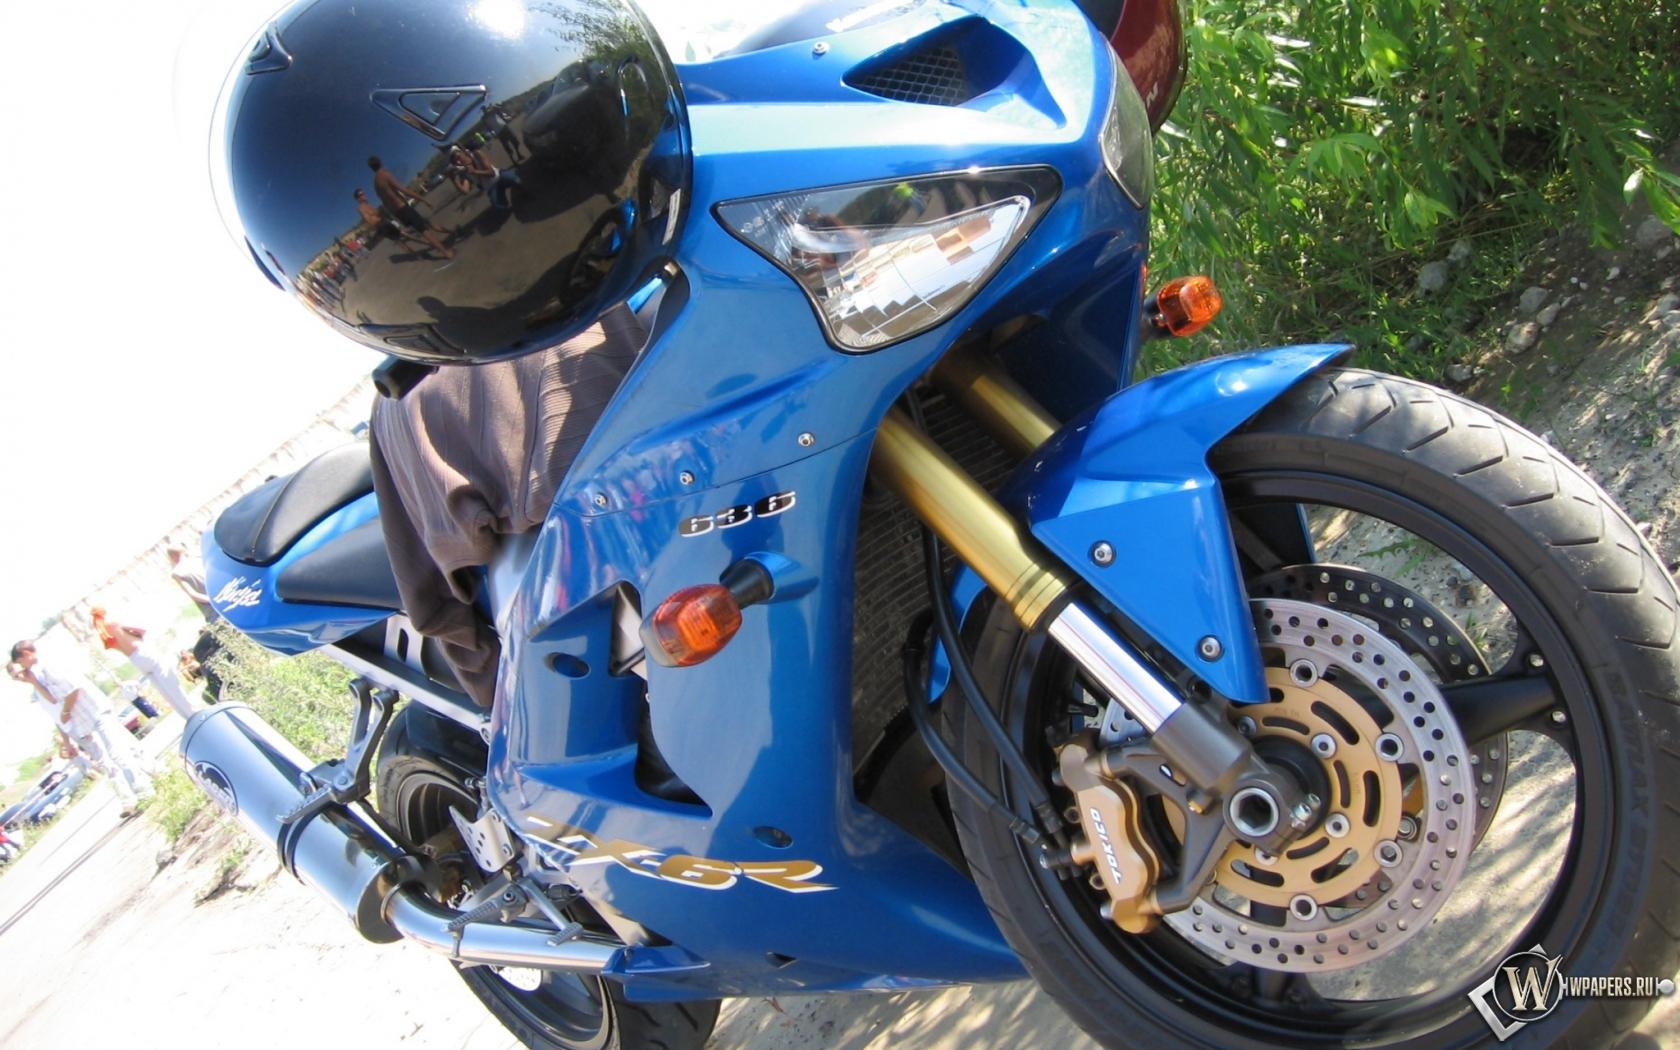 Kawasaki Ninja 1680x1050